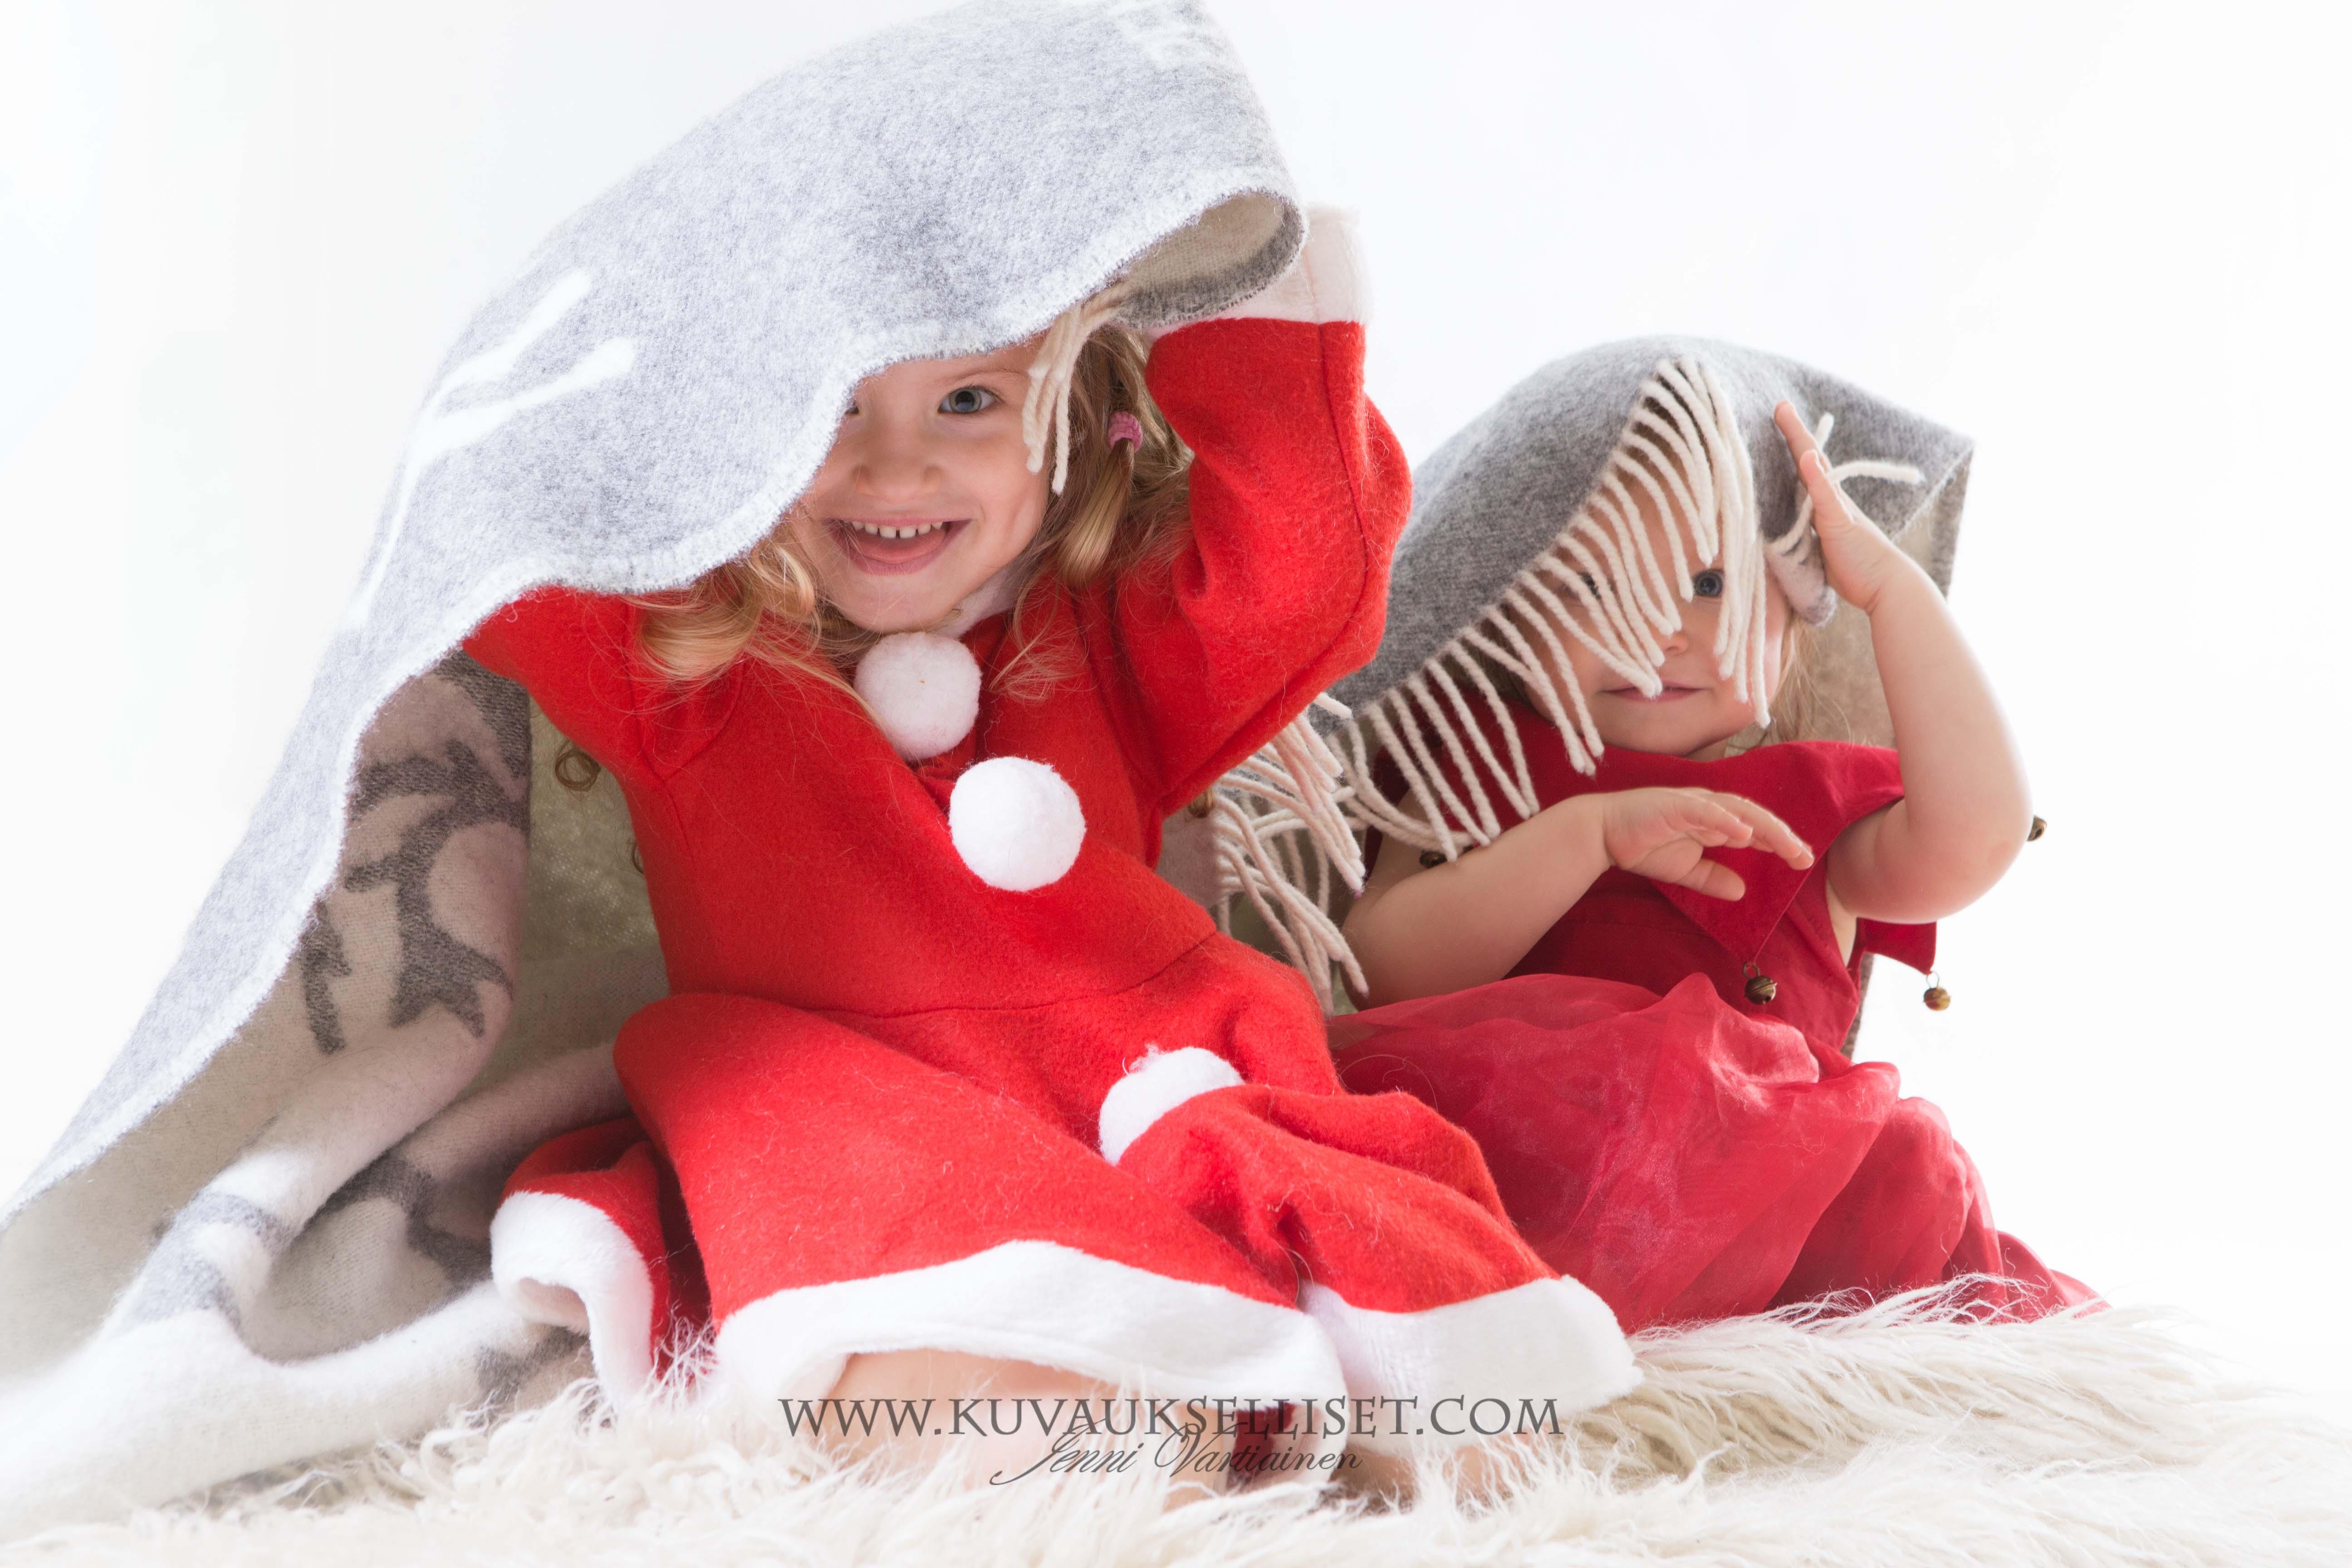 2014.11.10 lapsikuvaus studiokuvaus sisaruskuvaus perhekuvaus 1-vuotiskuvaus muotokuva-4